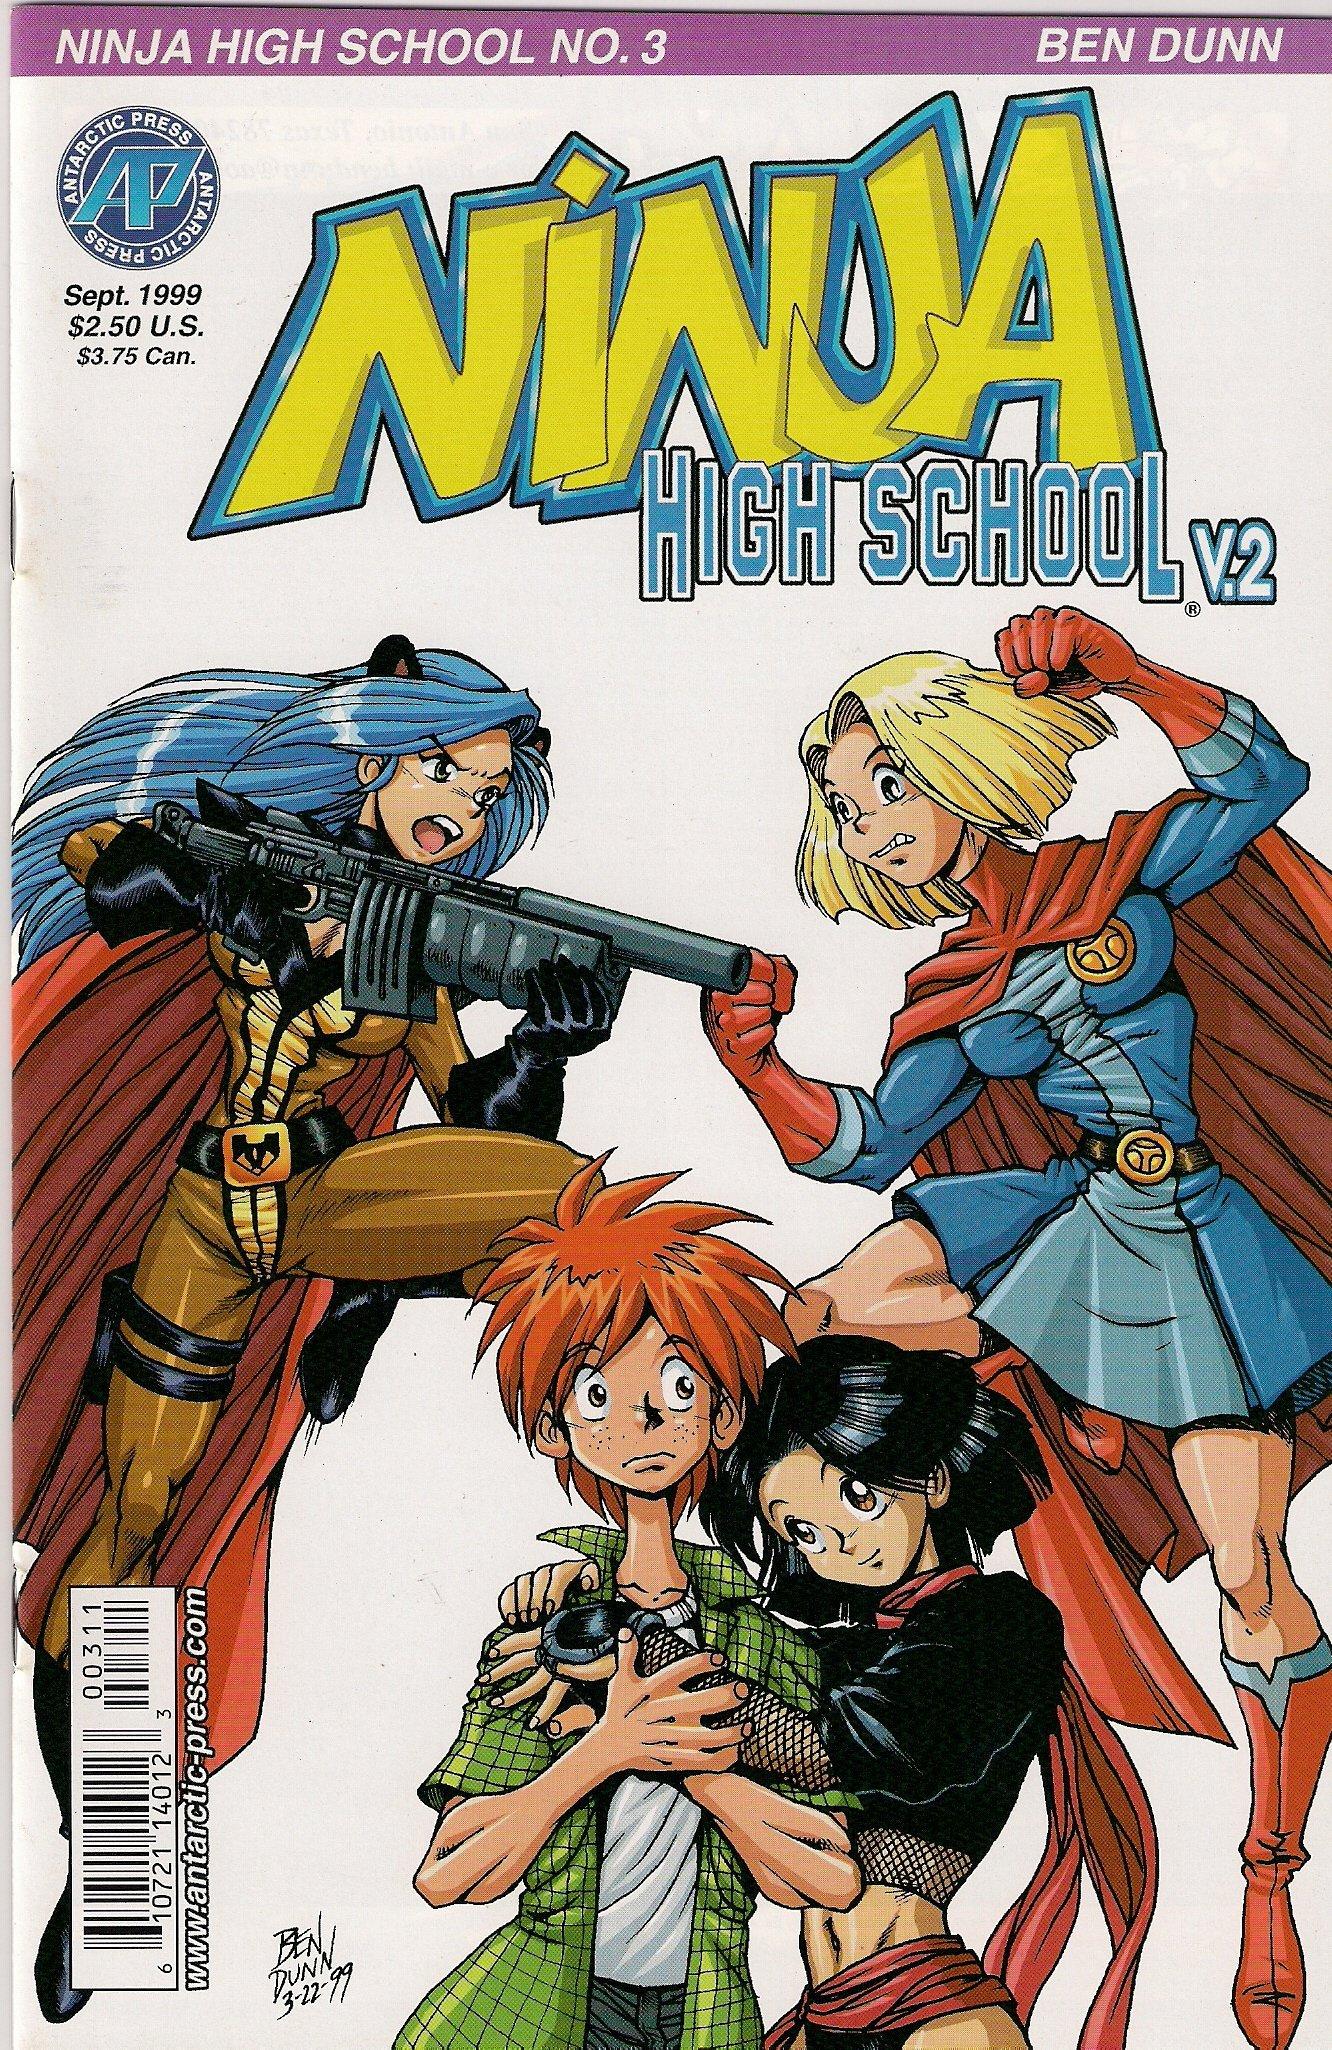 NINJA HIGH SCHOOL VOLUME 2 NO. 3 MANGA ANTARCTIC PRESS ...